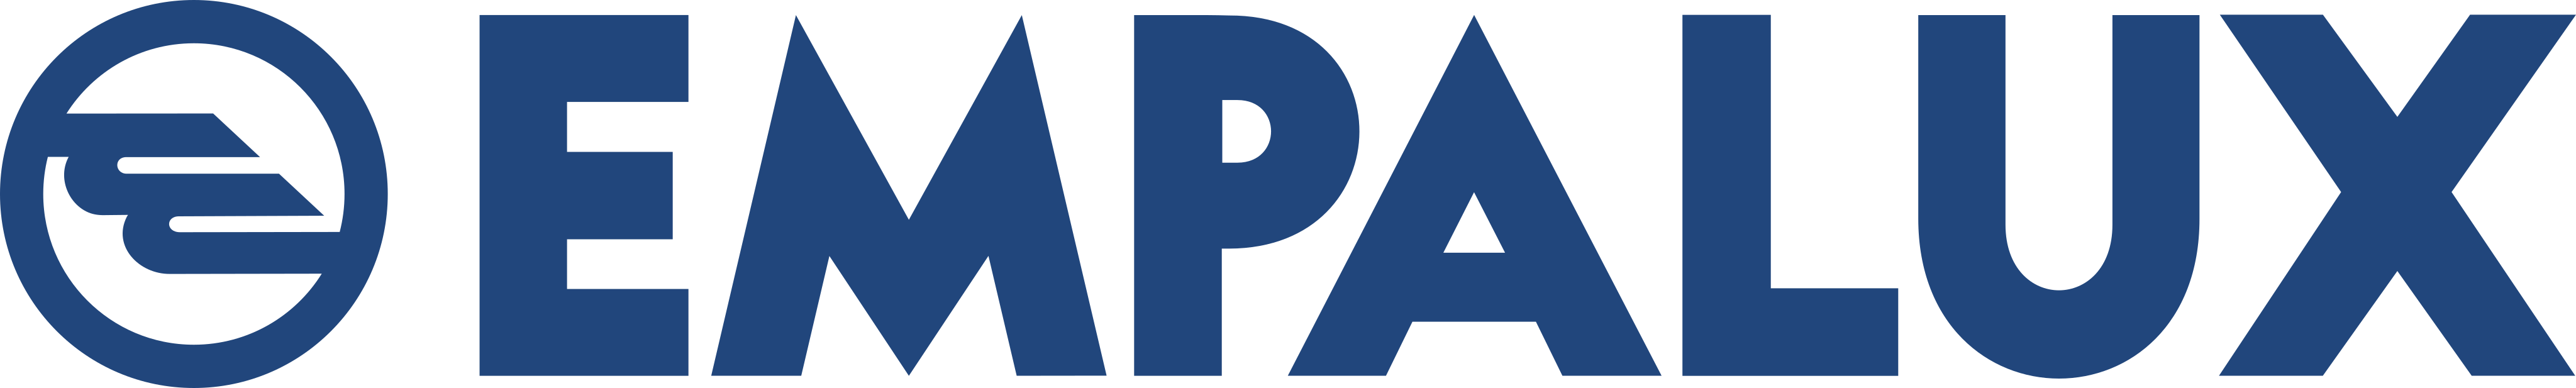 Empalux Logo.